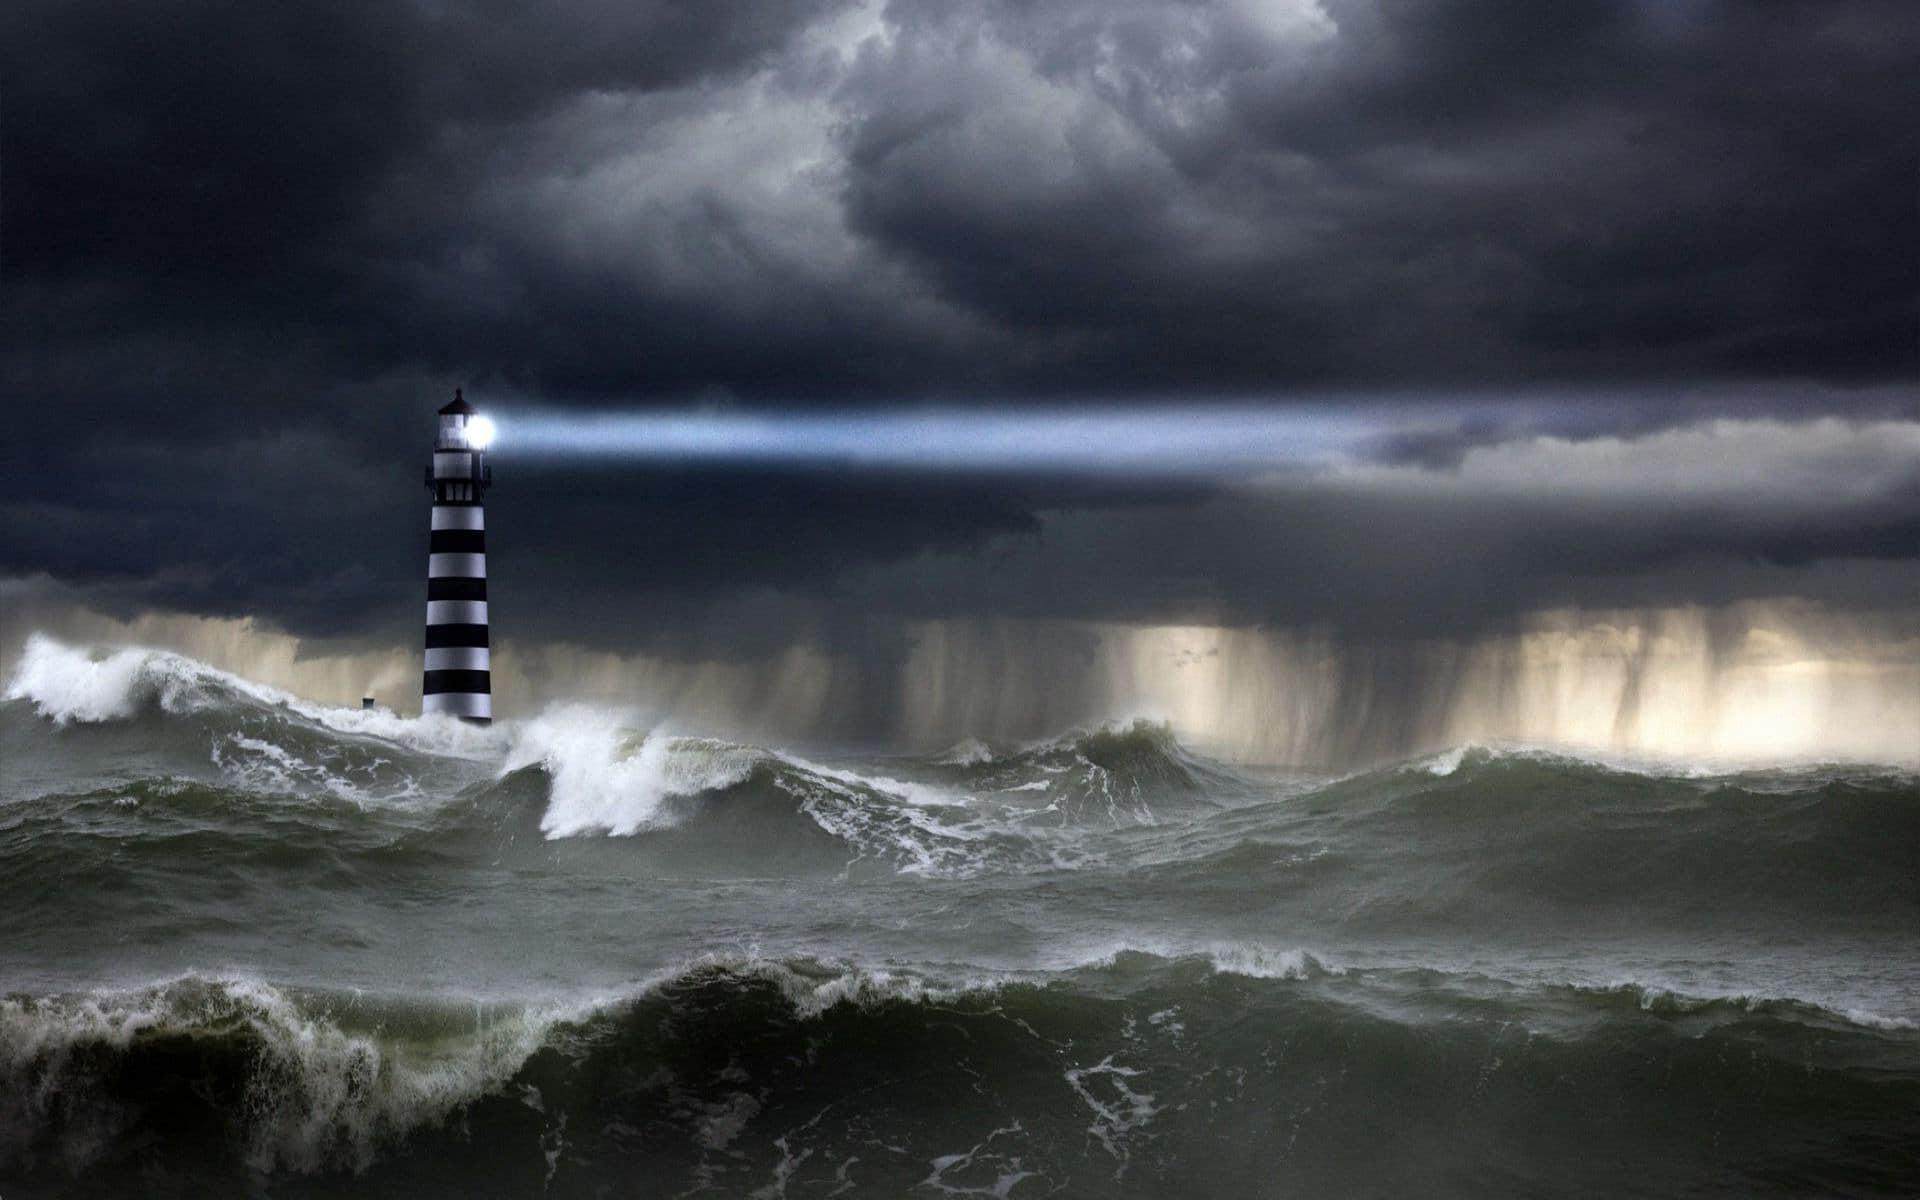 lighthouse storm wallpaper 3 dmc fitness